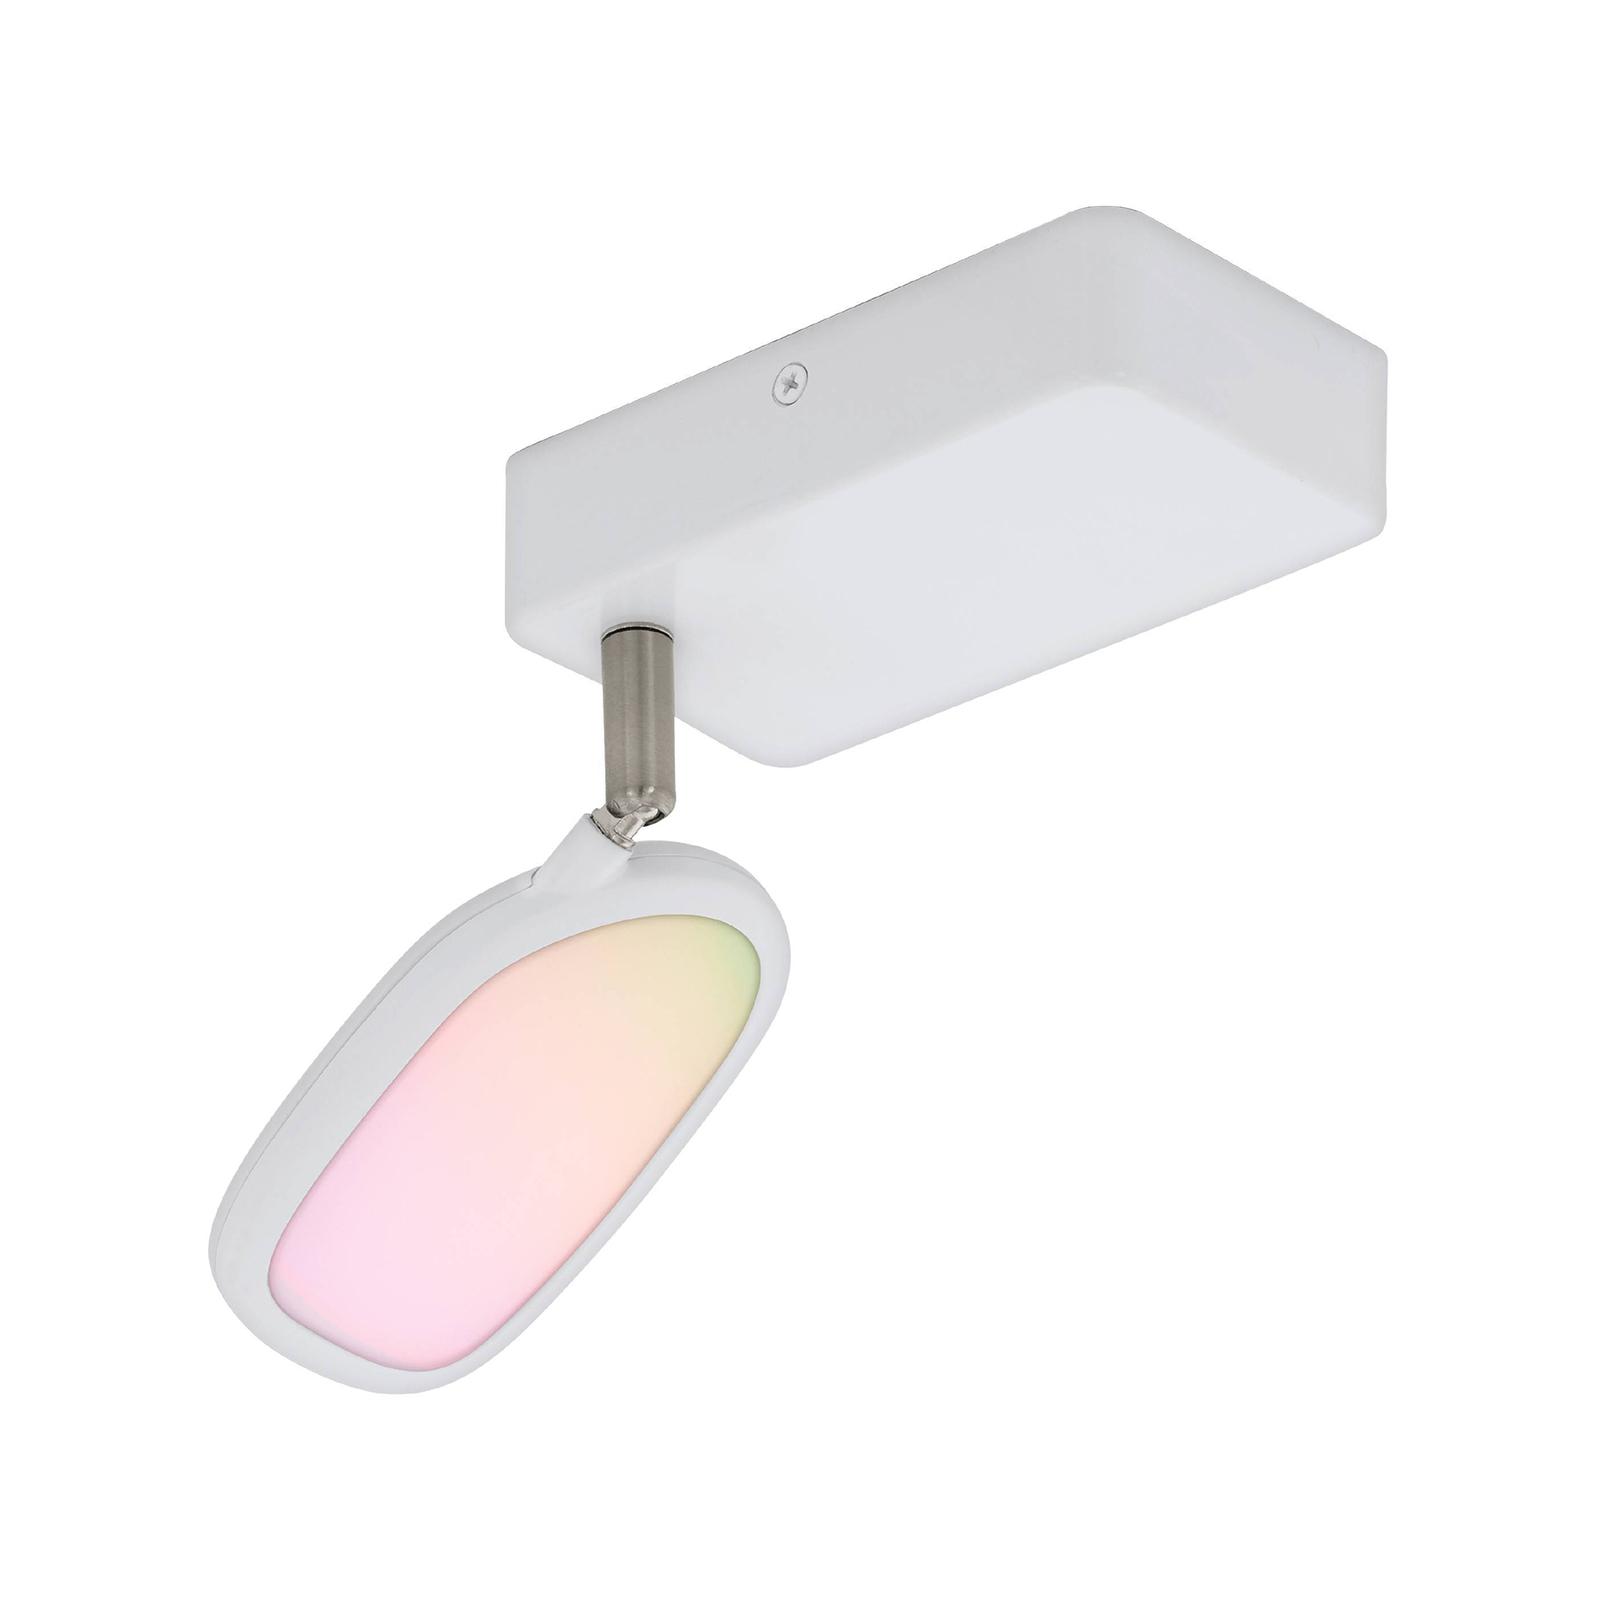 EGLO connect Palomable-C LED-takspot 1 lyskilde